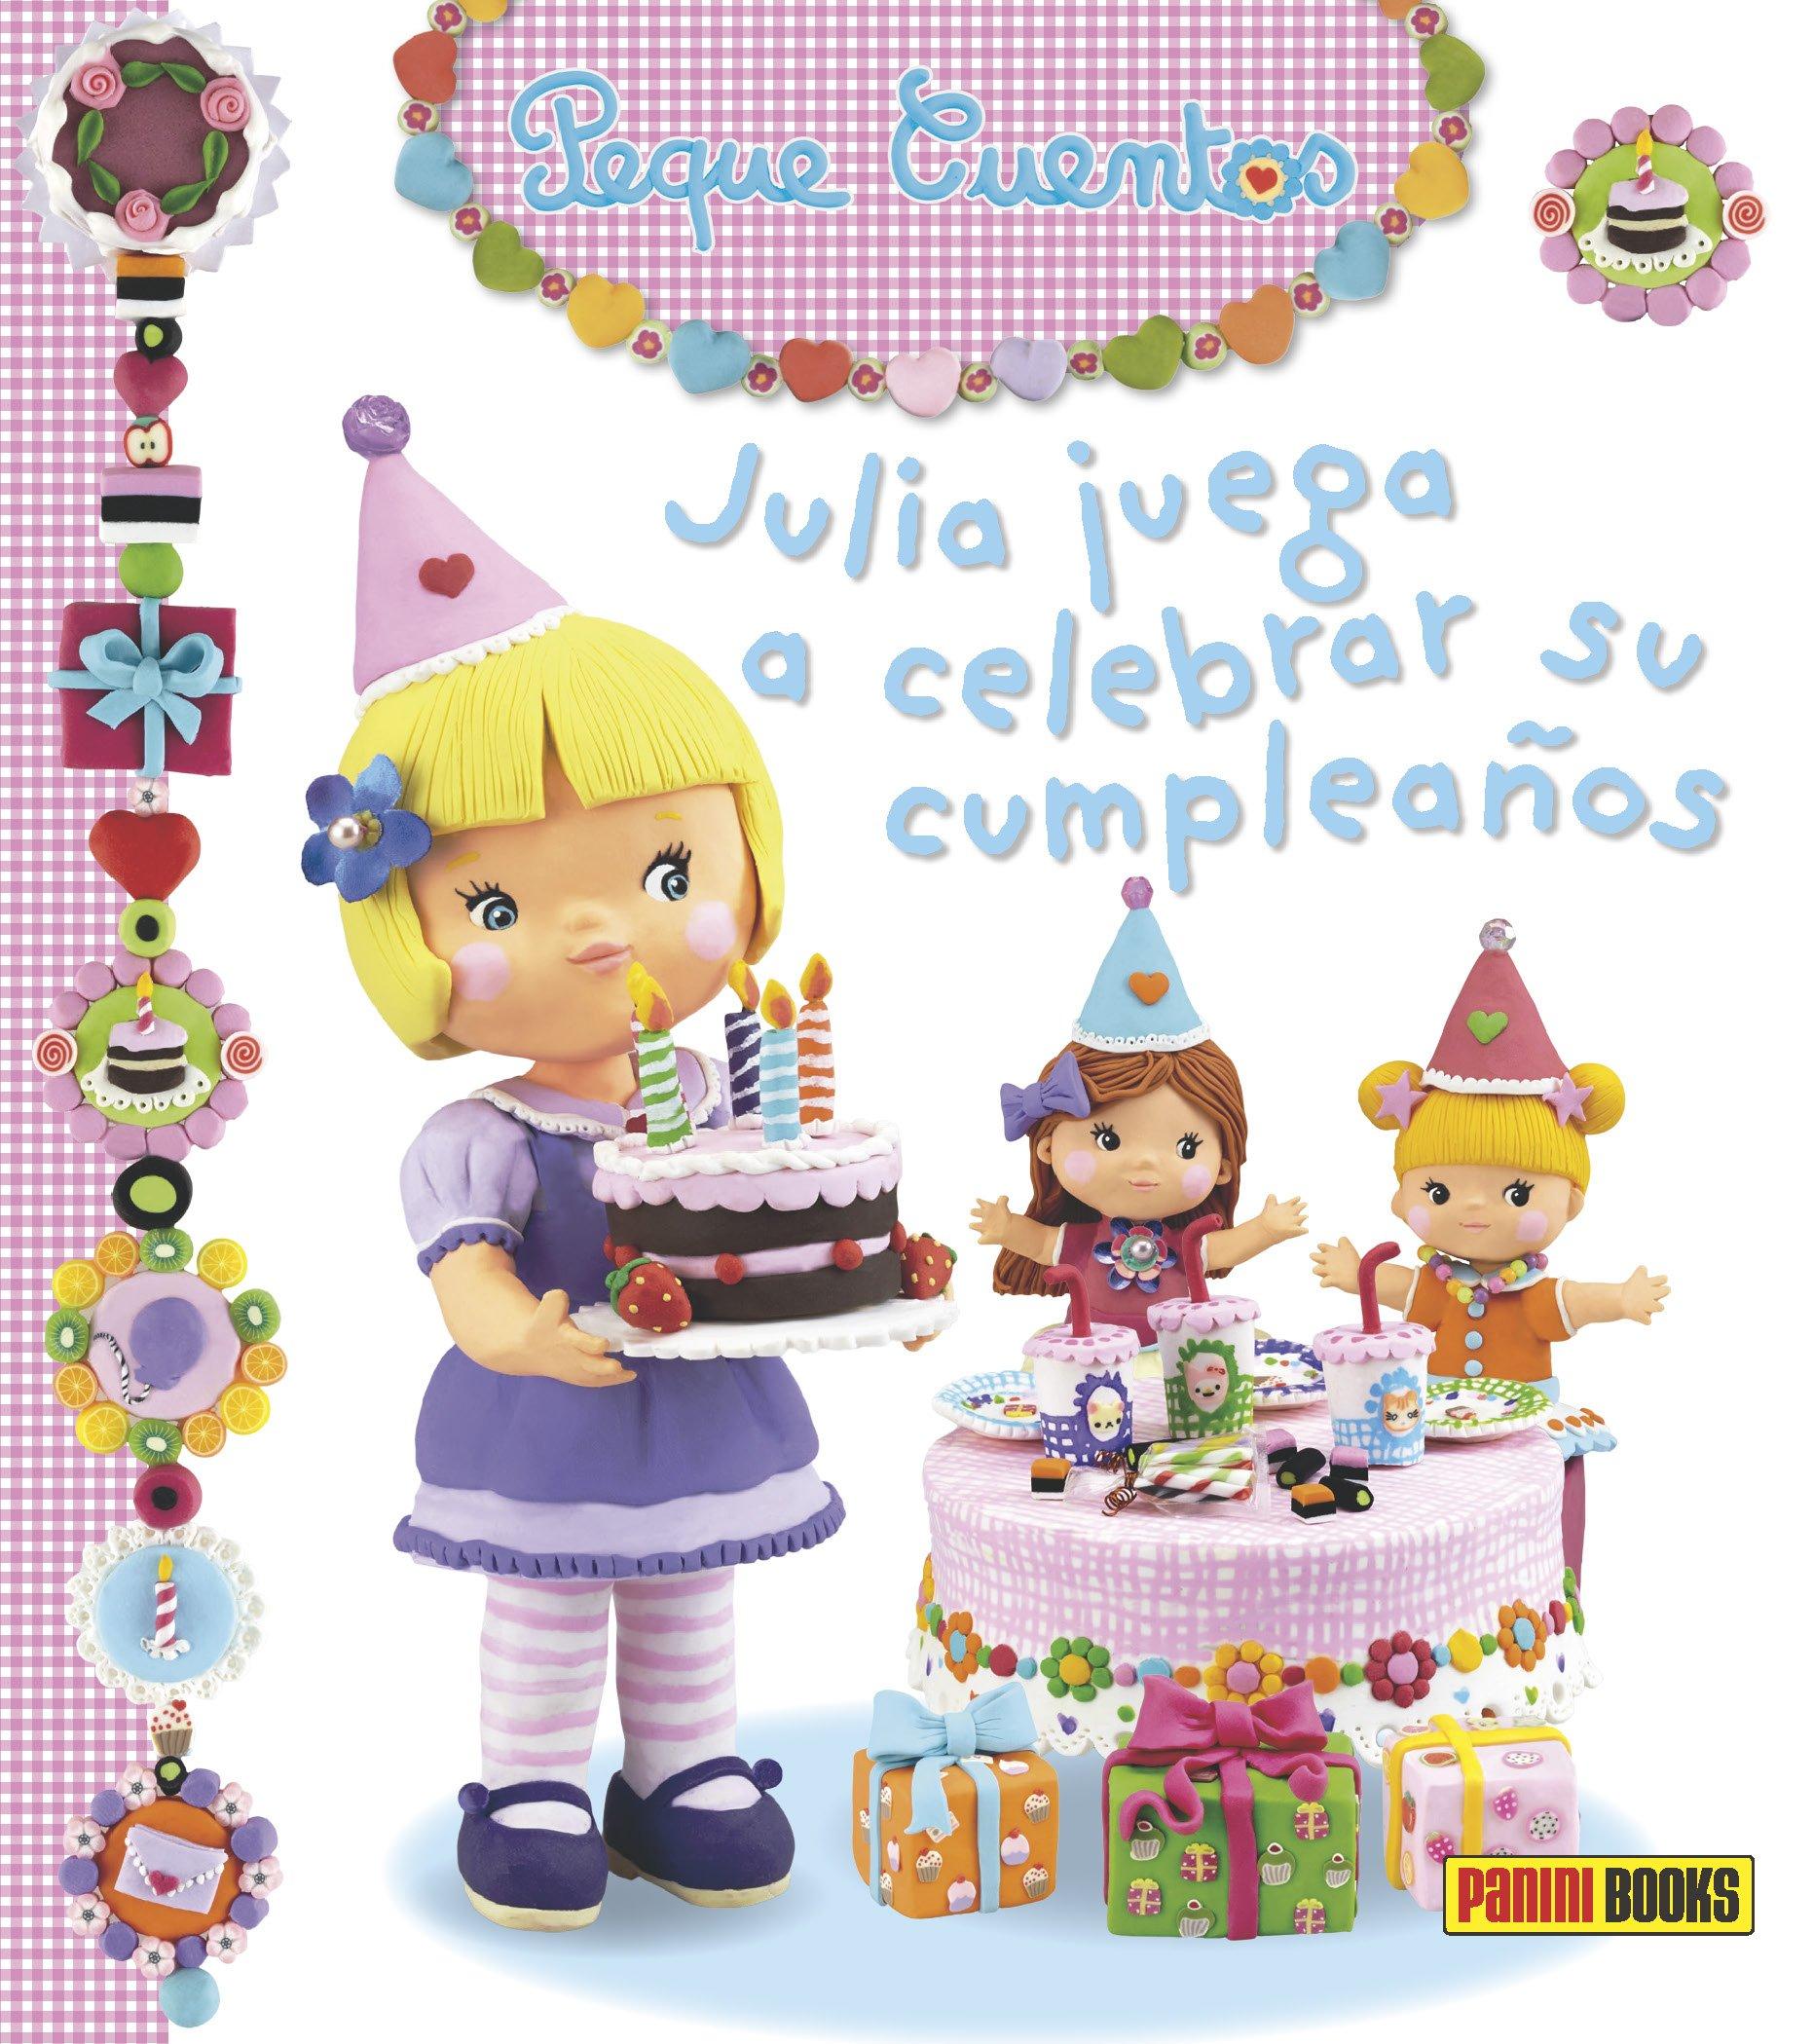 Julia juega a celebrar su cumpleaños: AA.VV: 9788490941461 ...